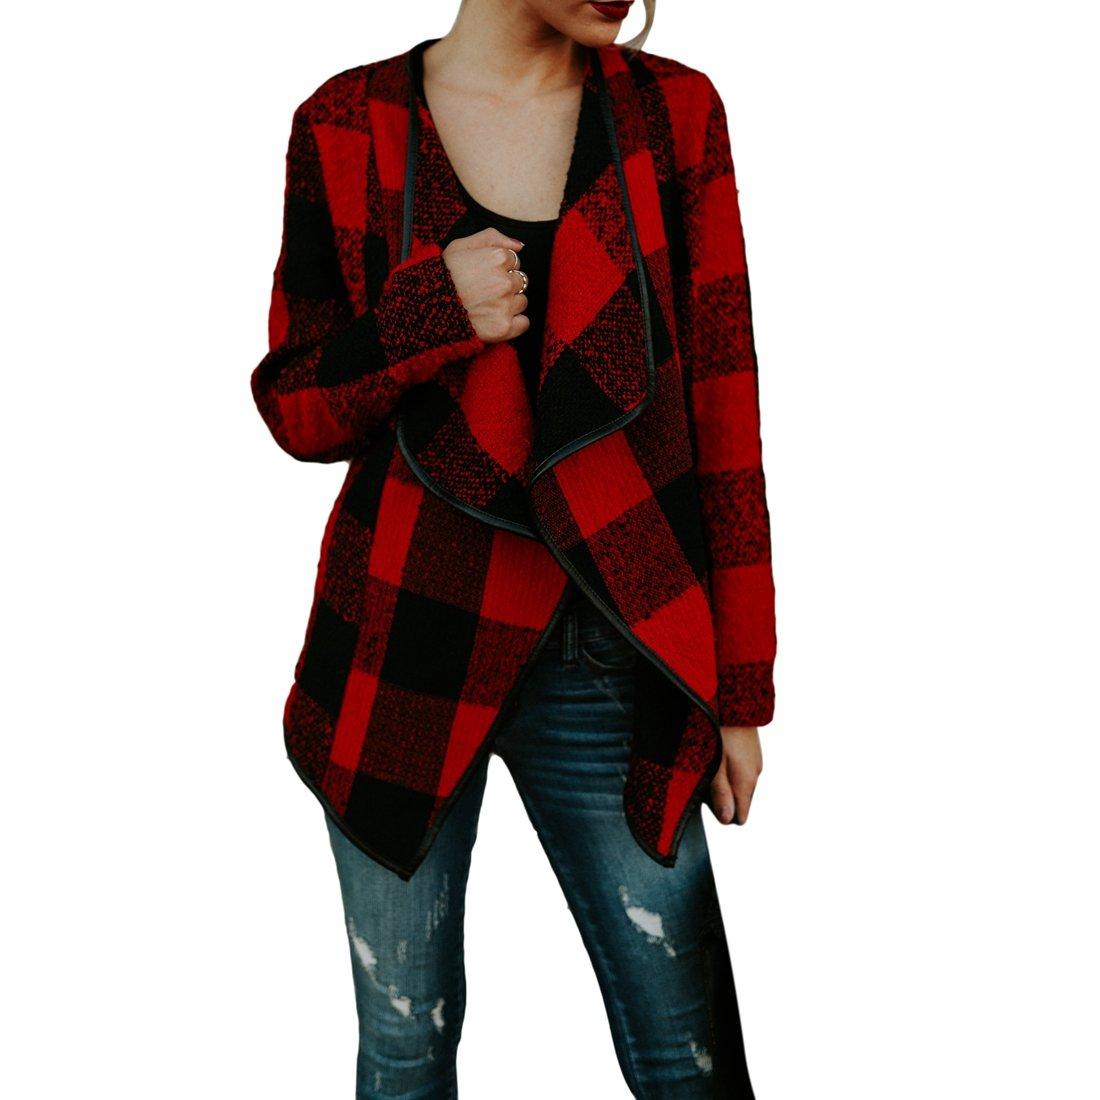 Shinekoo Women Cardigan Jacket Checked Plaid Open Front Coat Outwear